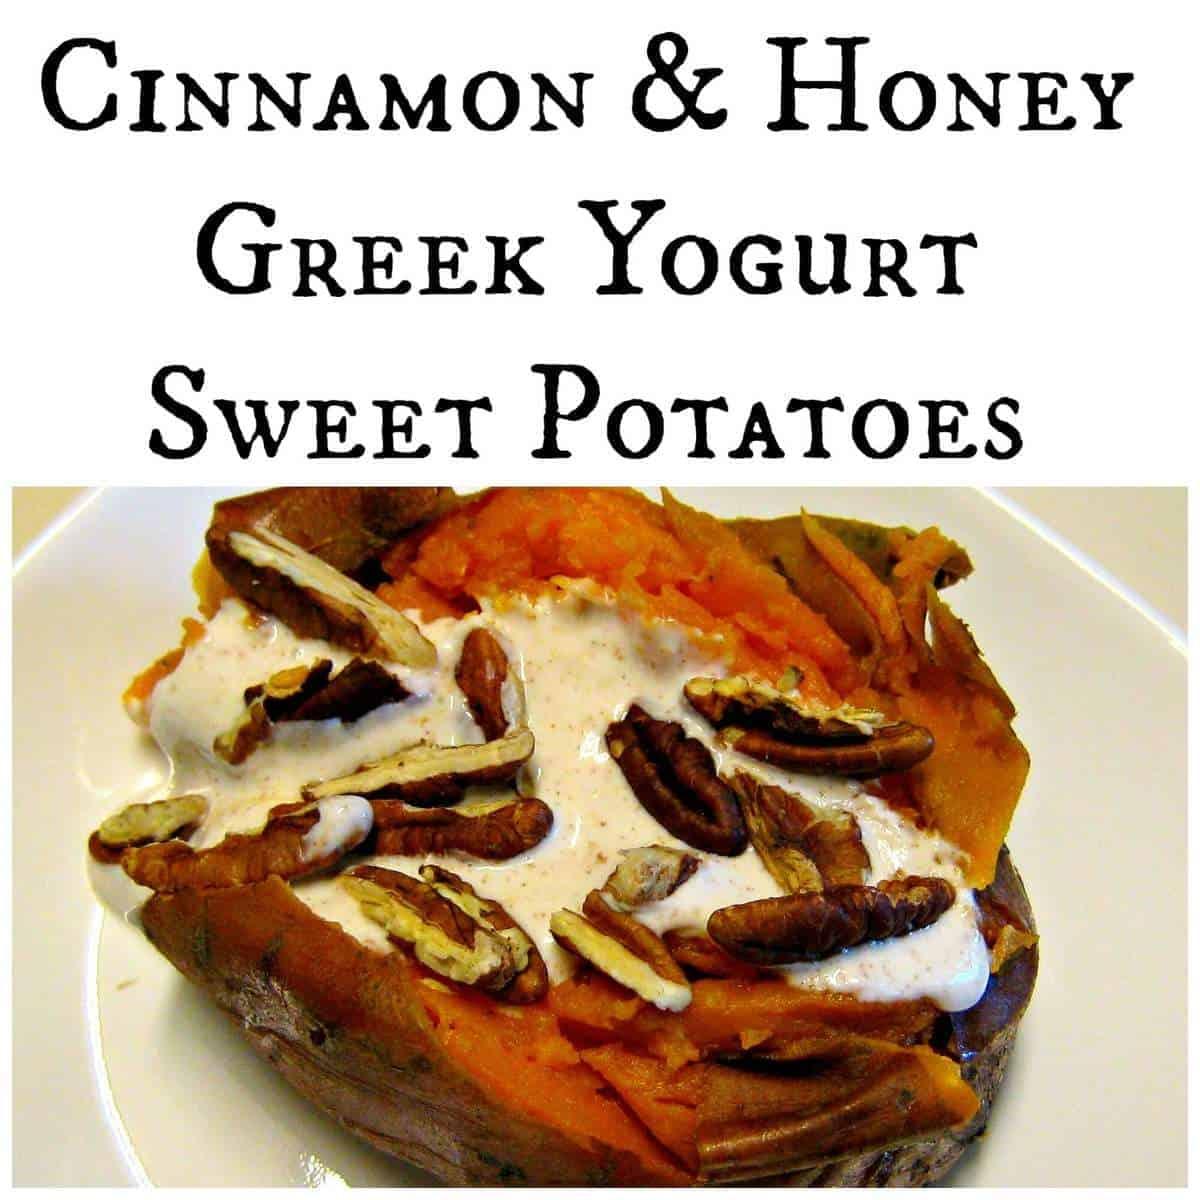 Cinnamon & Honey Greek Yogurt Sweet Potatoes